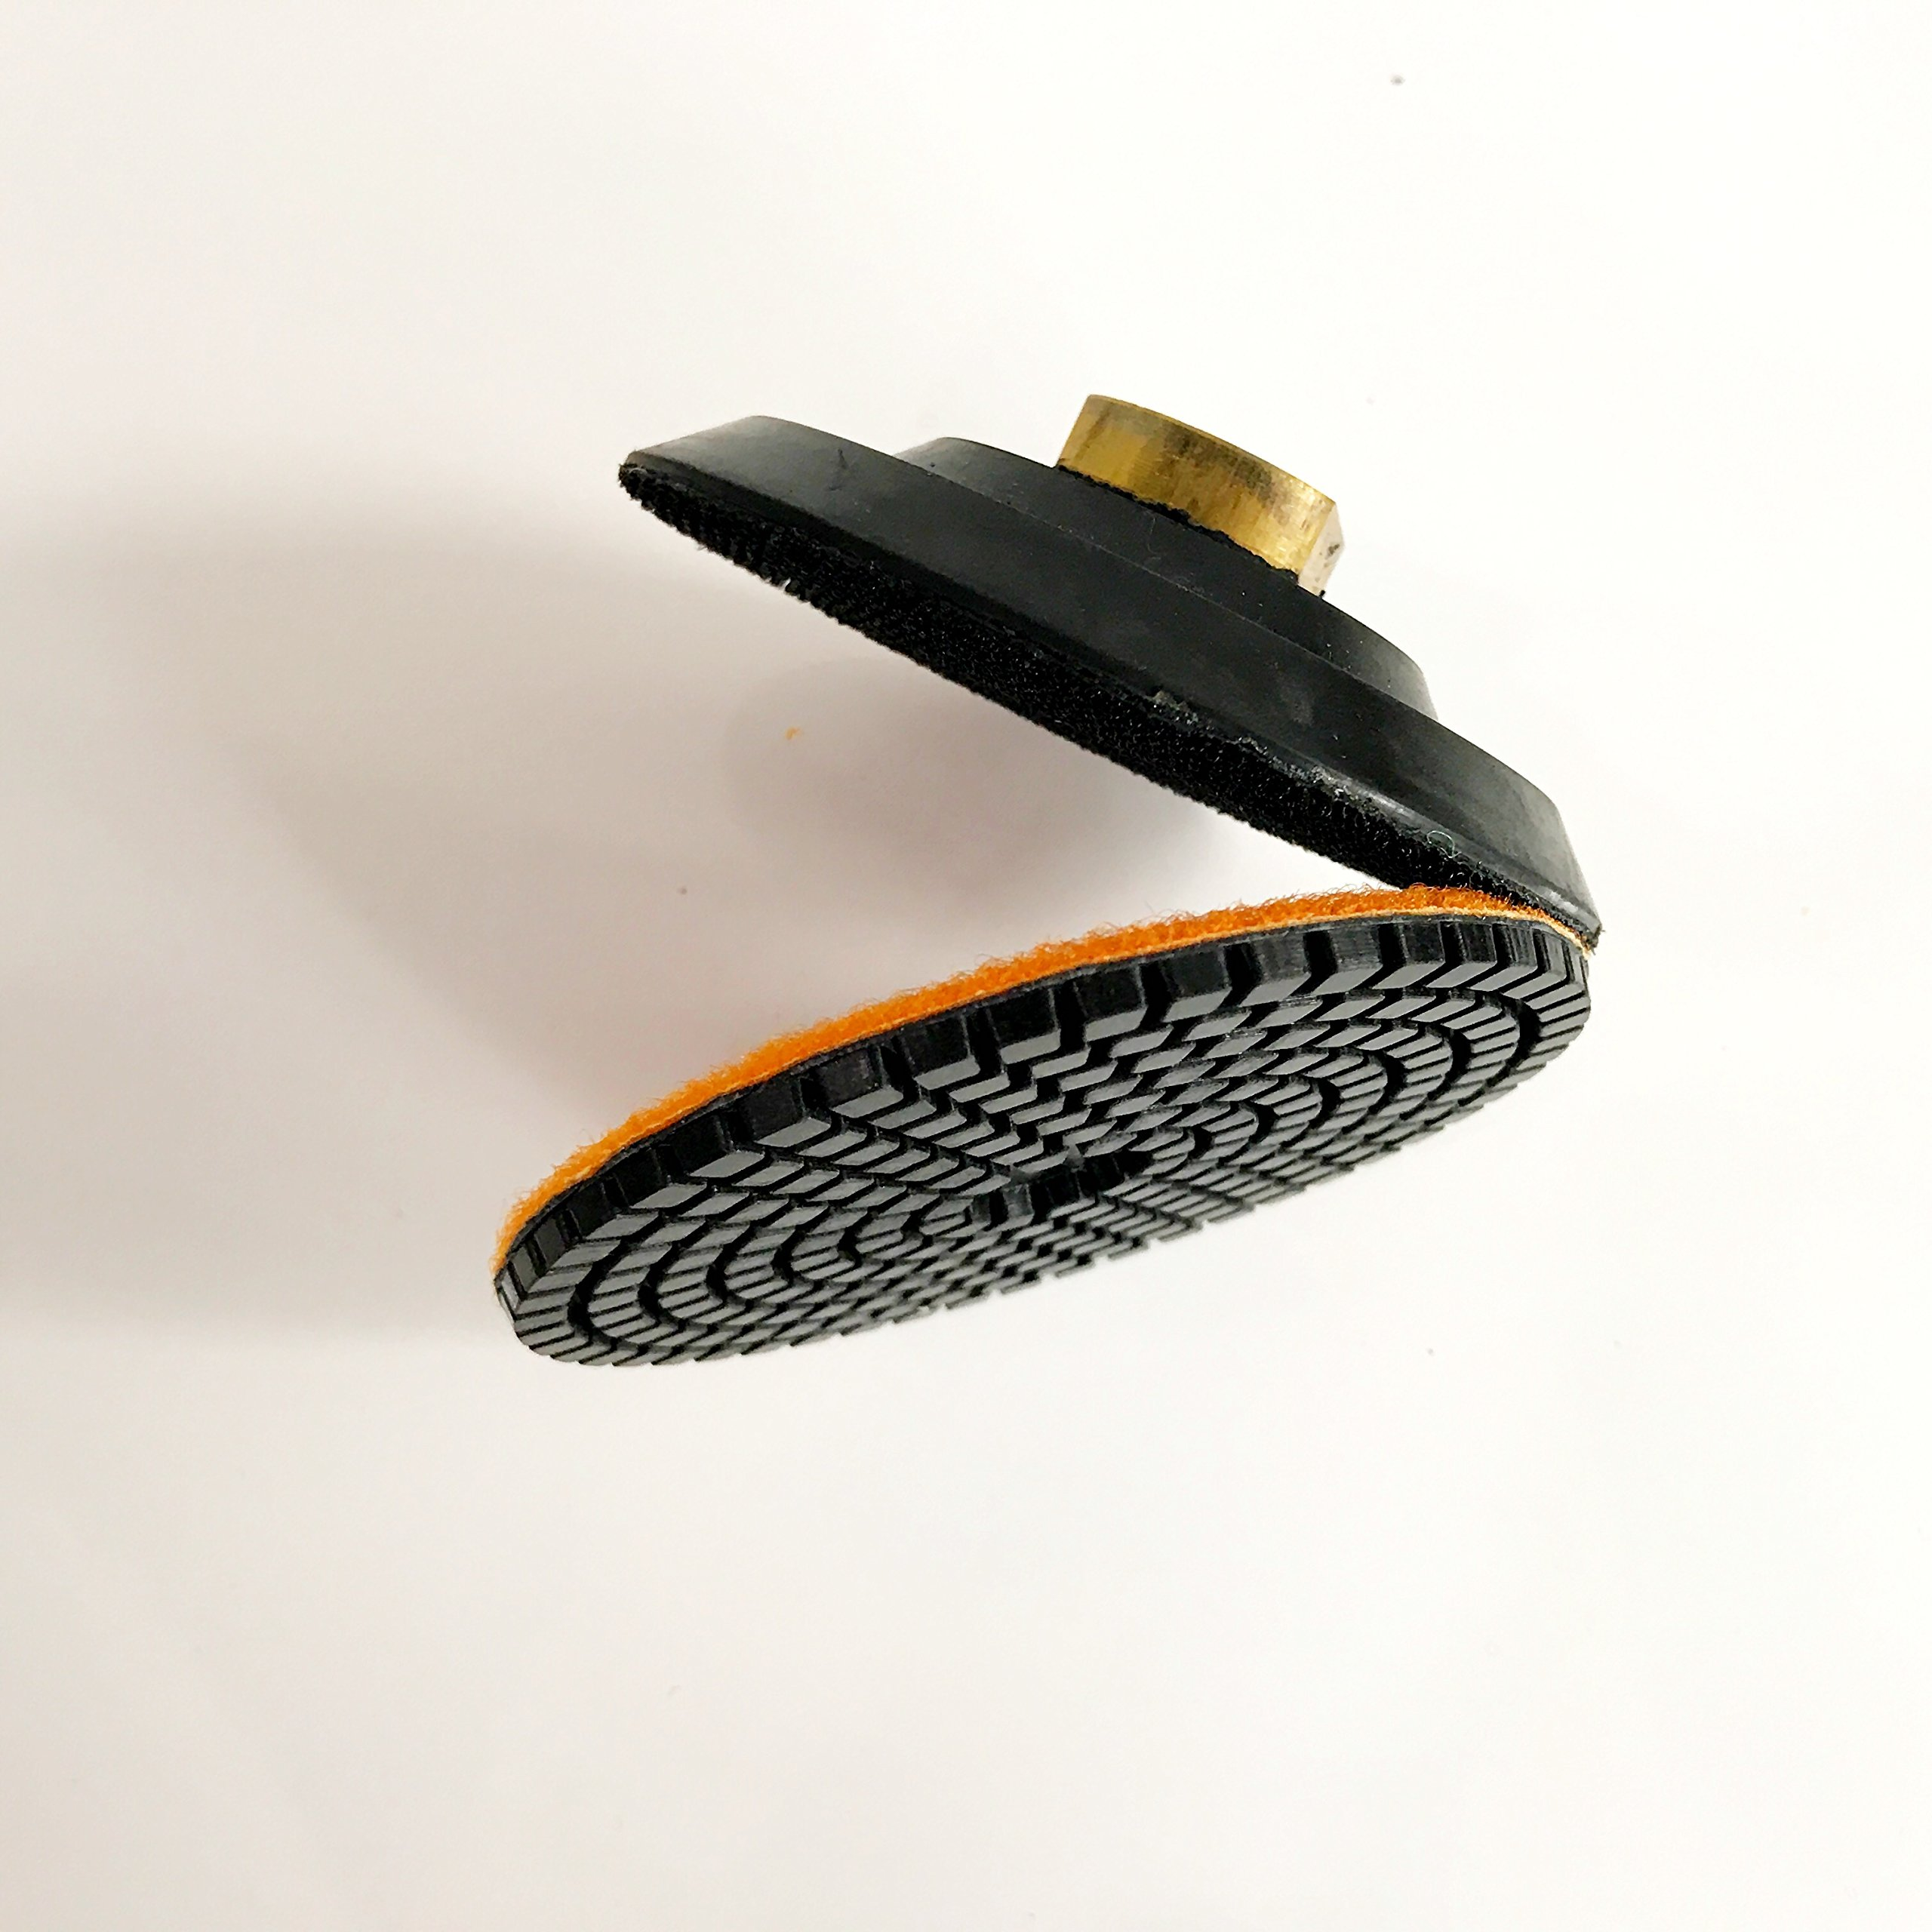 TUFF BUFF - Wet/Dry Diamond Polishing Pads - 11 Piece Set with Rubber Backer for Granite, Stone, Concrete, Marble, Travertine, Terrazzo- 4'' Inch Pads by Tuff Buff (Image #8)